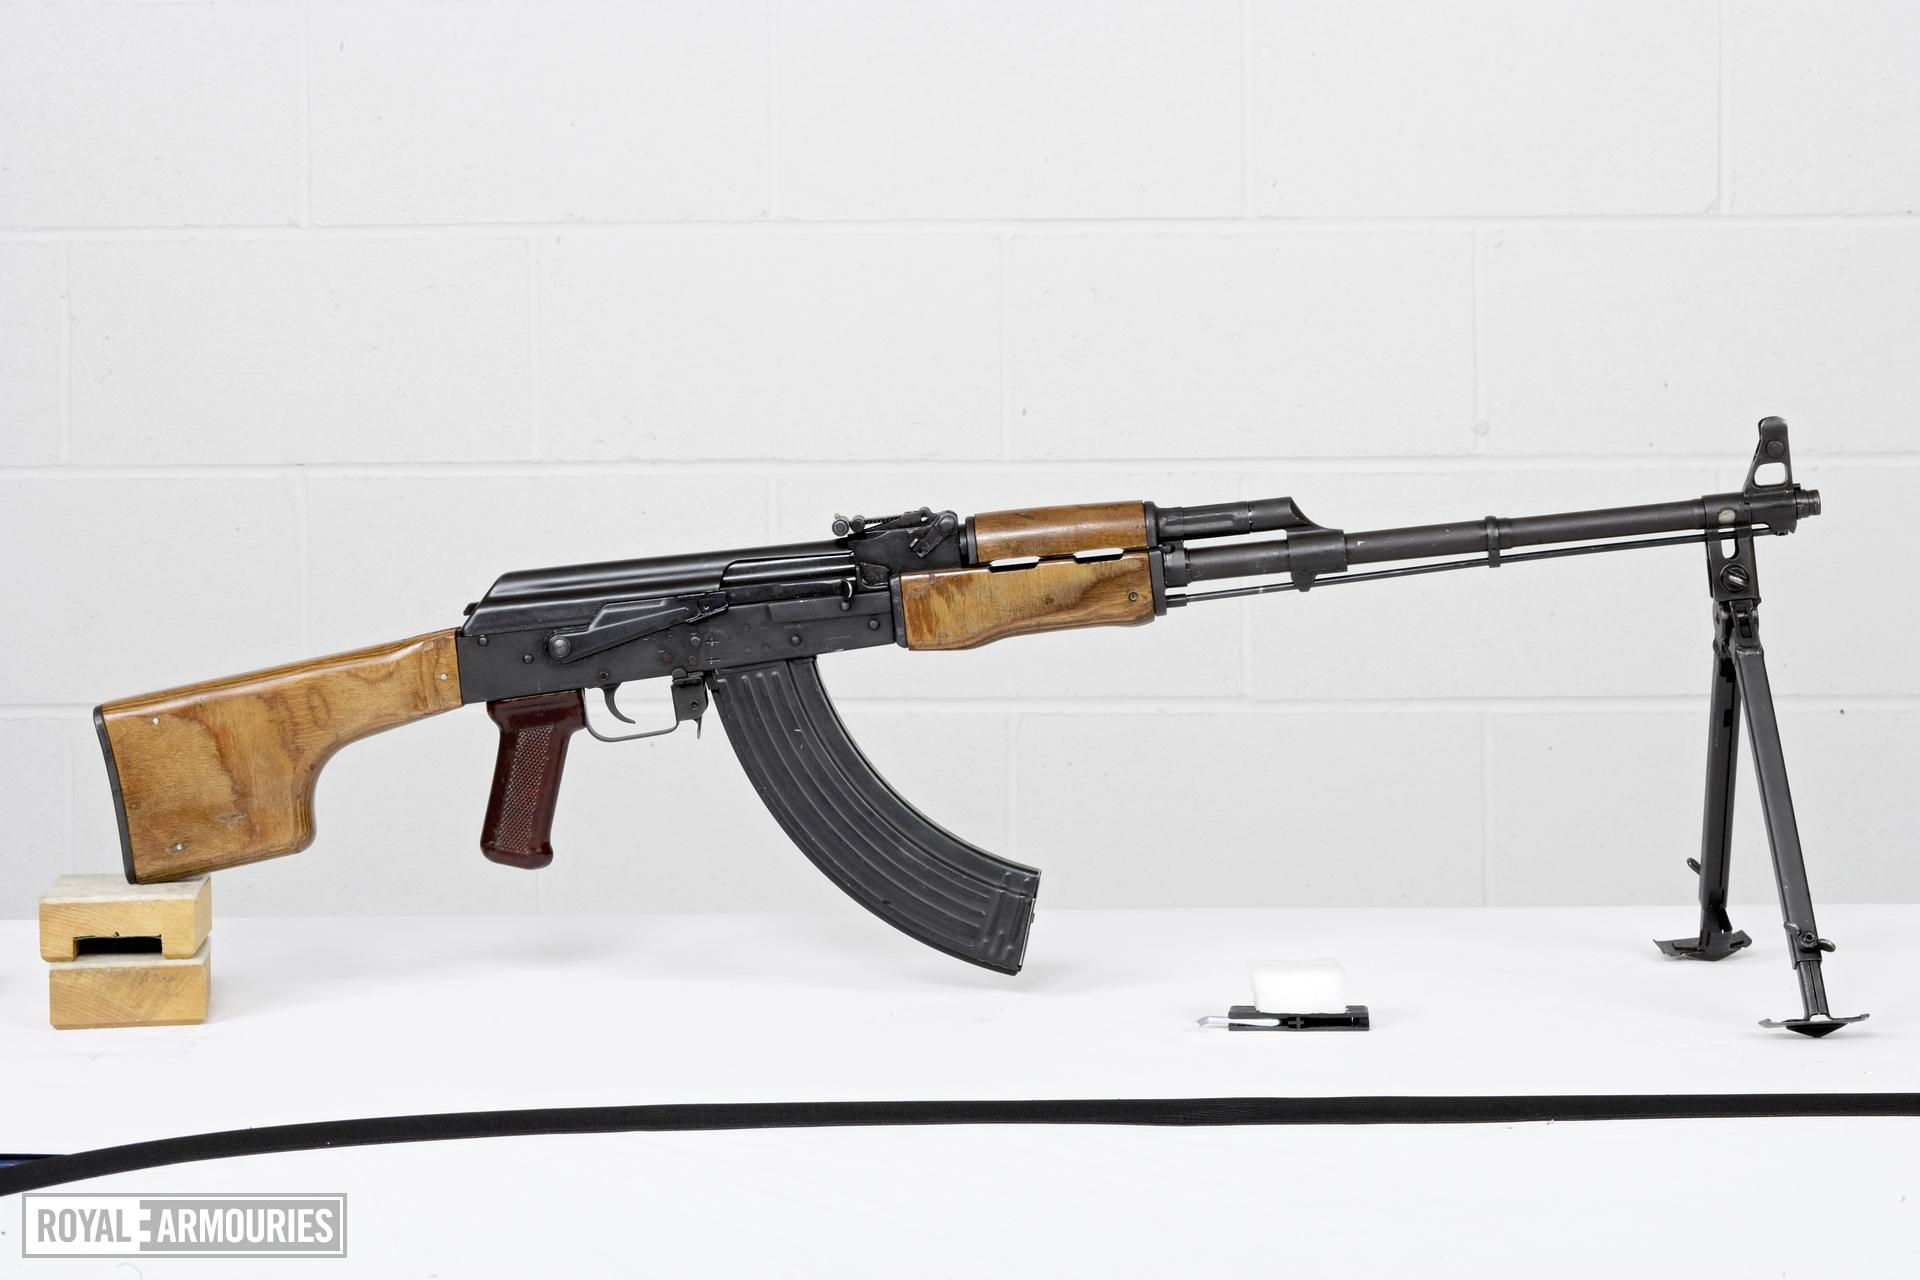 Centrefire automatic light machine gun - Kalashnikov RPK